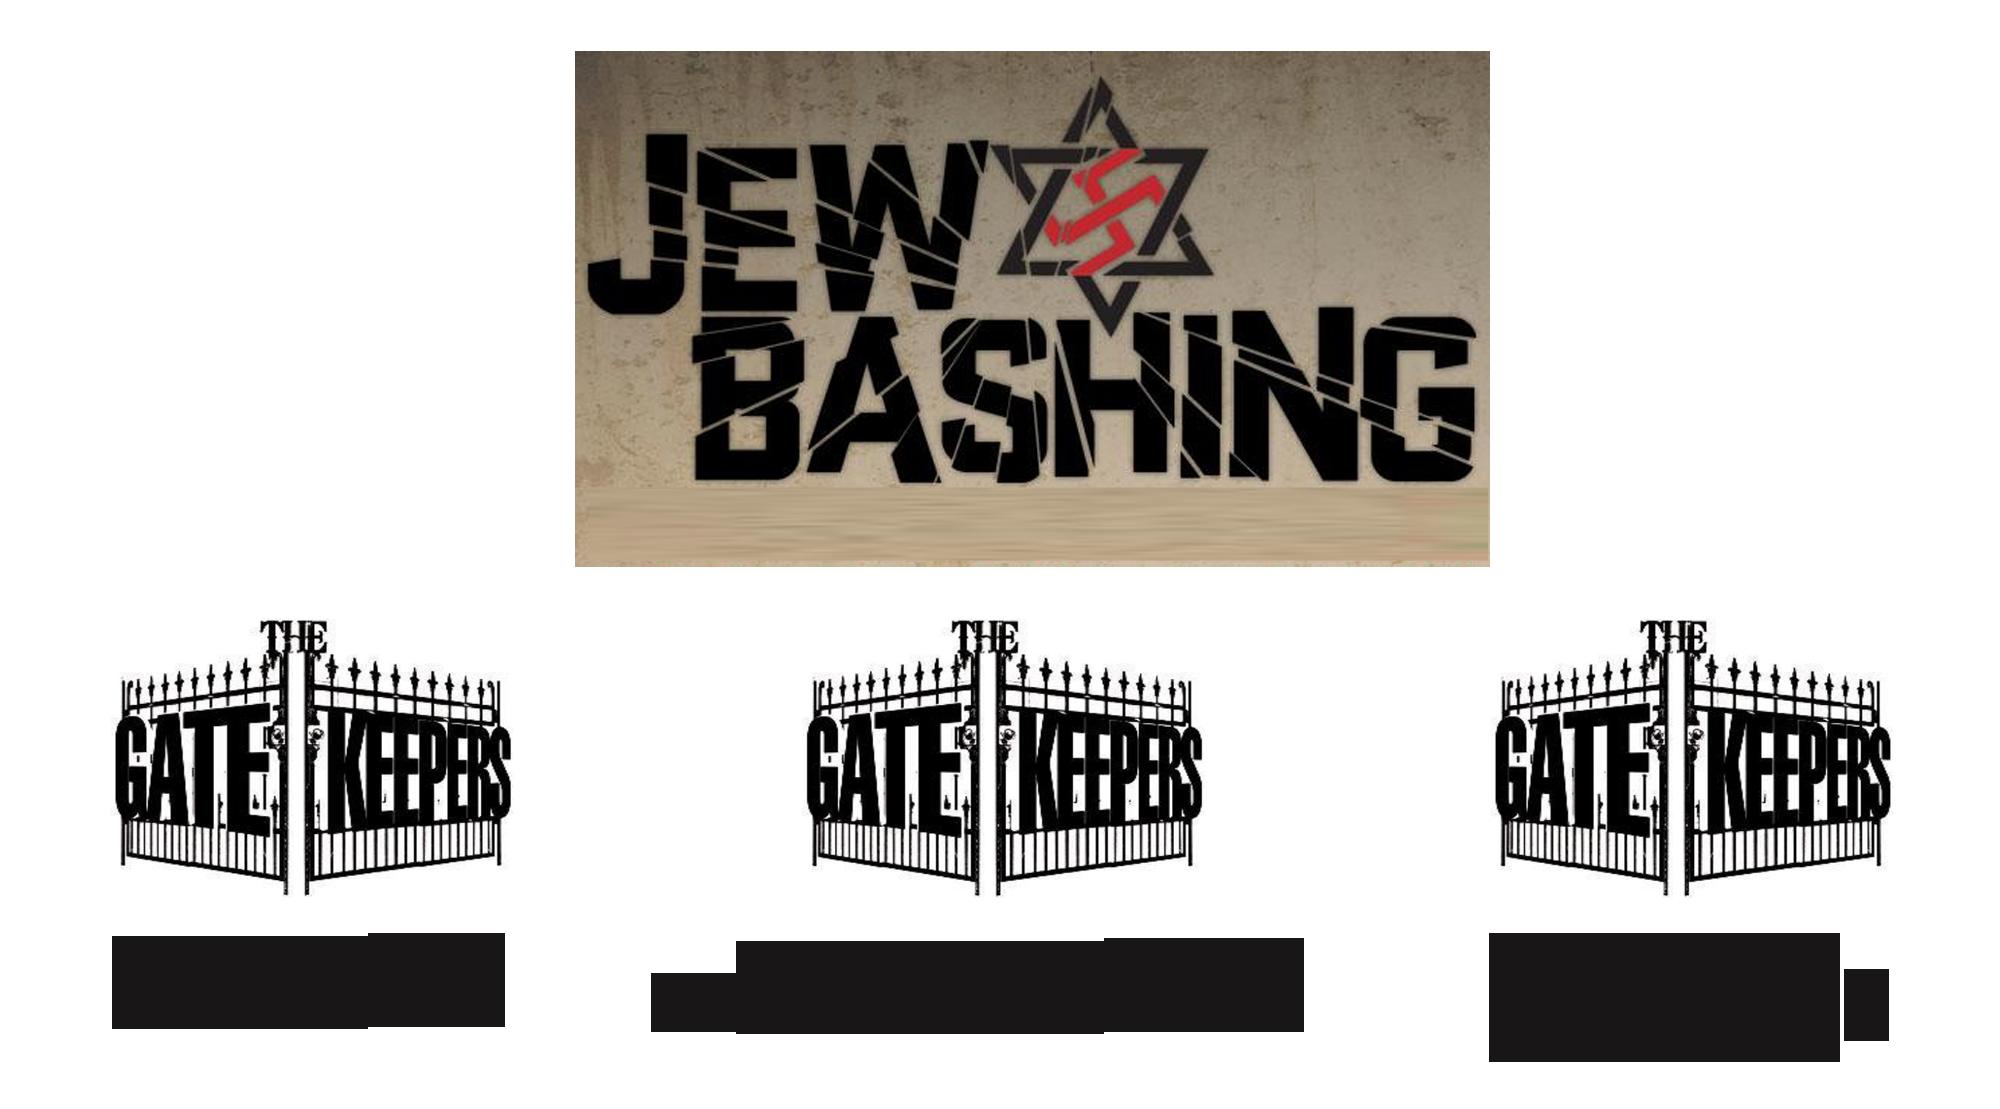 gate-keepers of antisemites